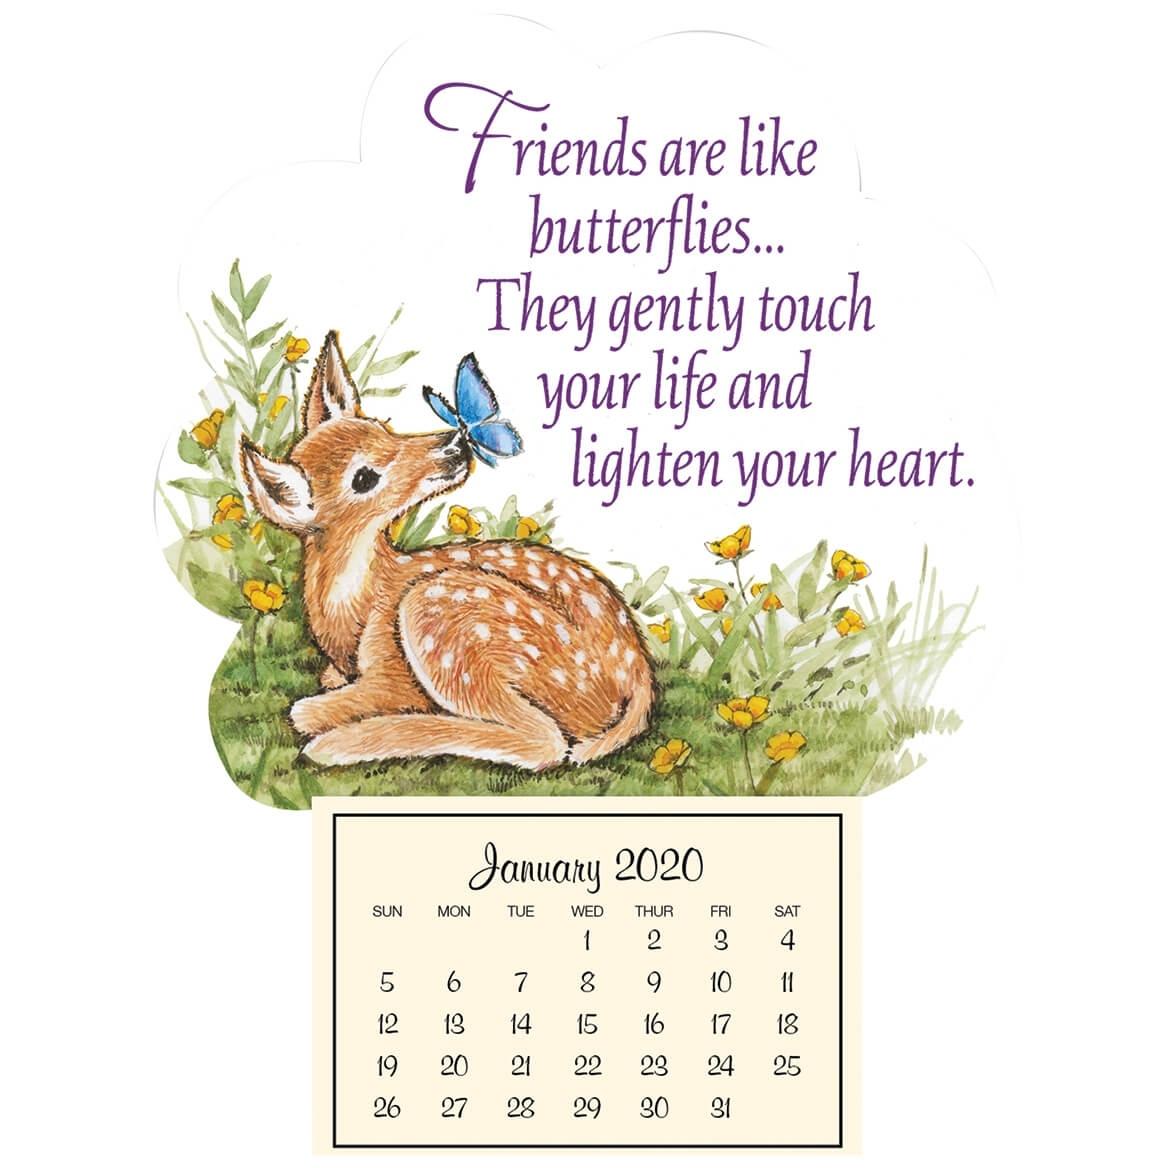 5 Year Calendar 2018-2019-2020-2021-2022 - Monthly Calendar Extraordinary 3 Year Calendar Reference Printable 2020-2022